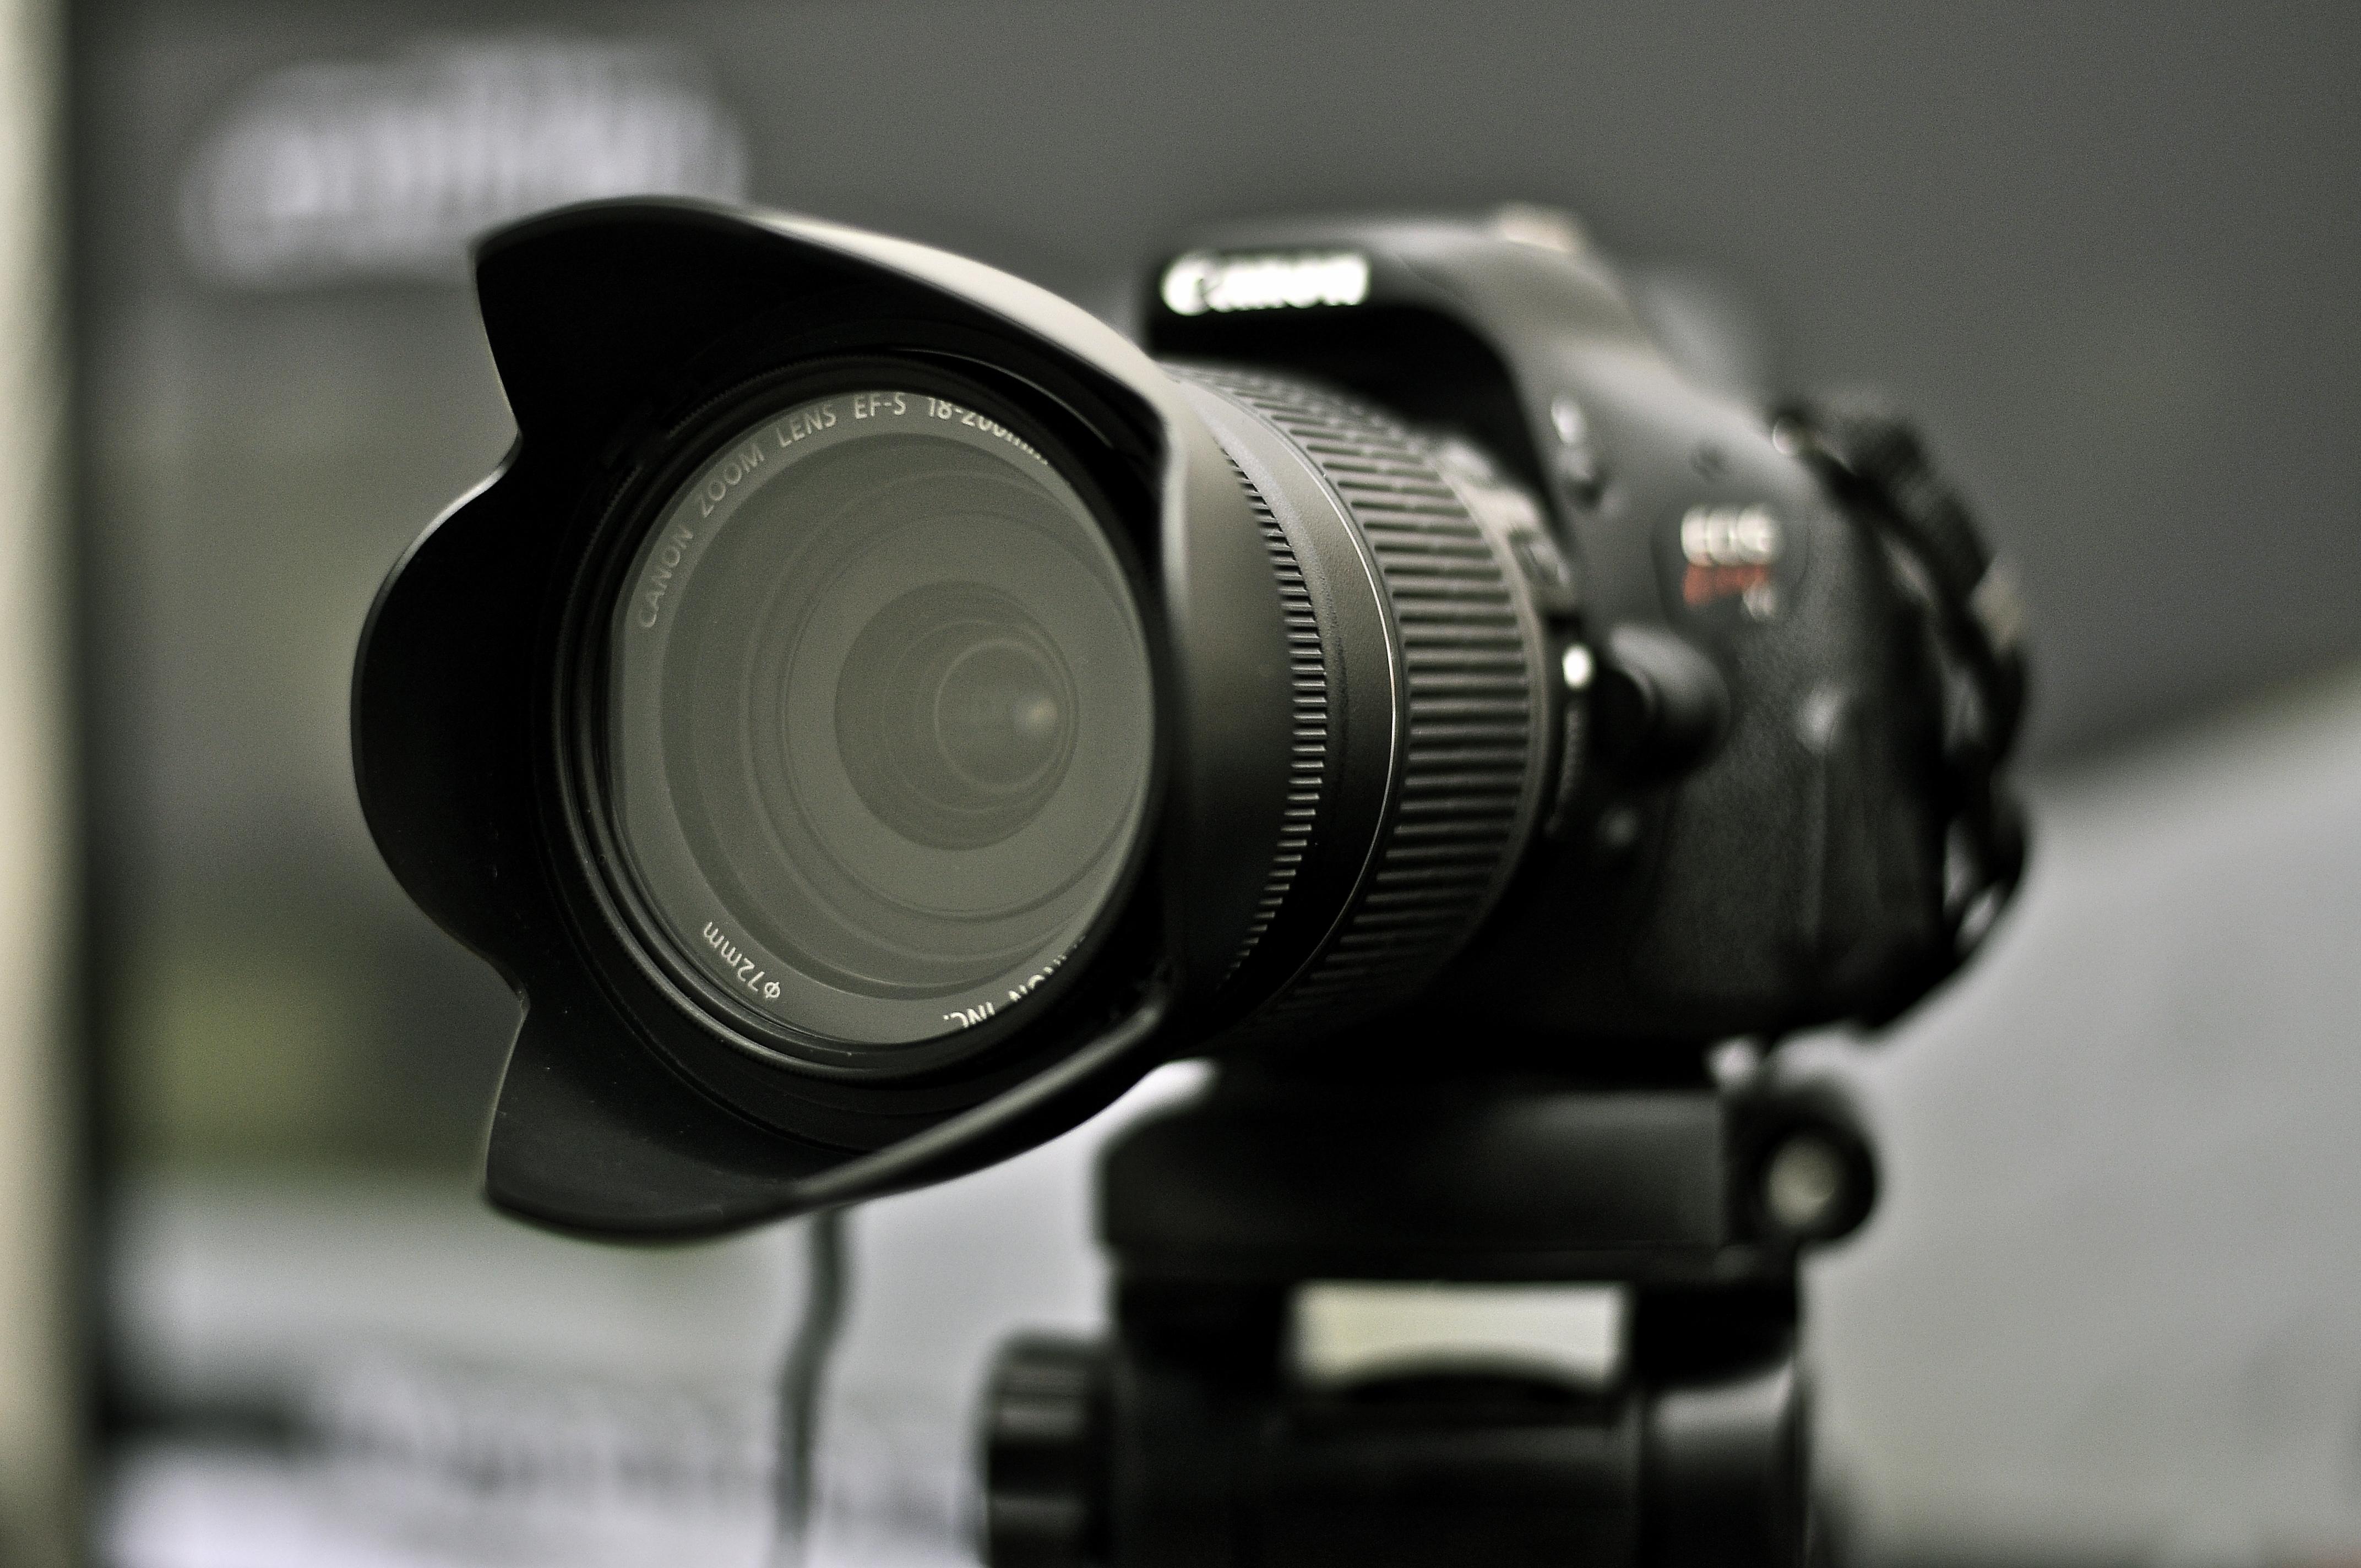 Camera Wallpaper 4k Hd 4288x2848 Wallpaper Teahub Io